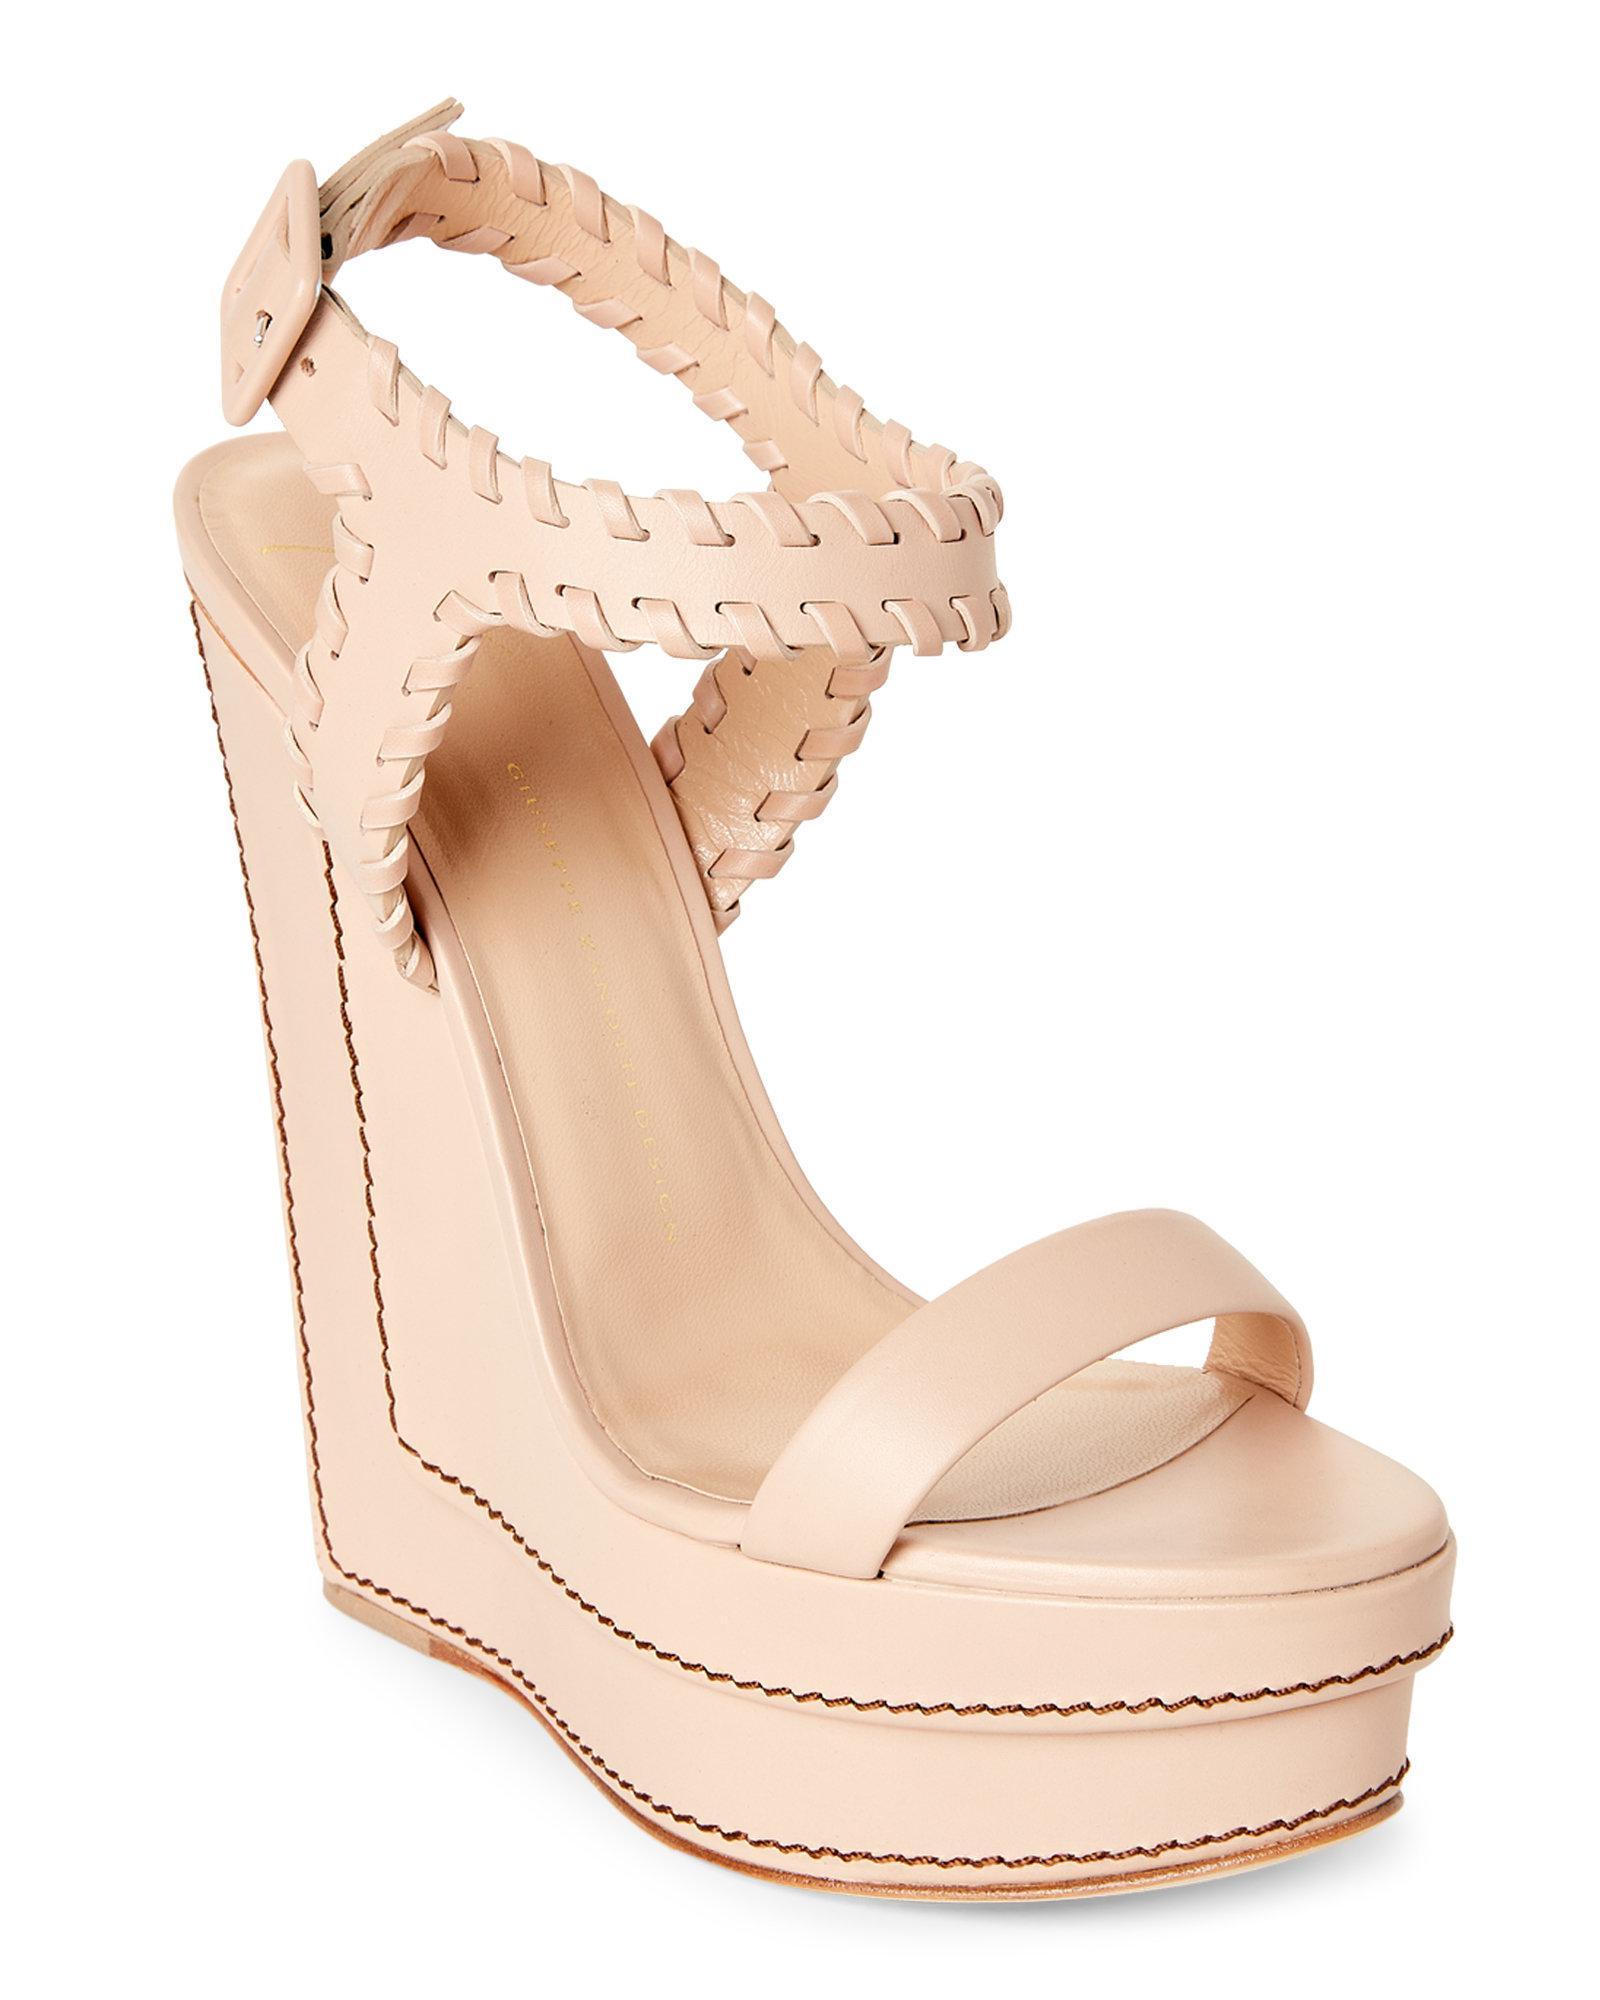 f0a534b1008c Lyst - Giuseppe Zanotti Whipstitch Leather Platform Wedge Sandals